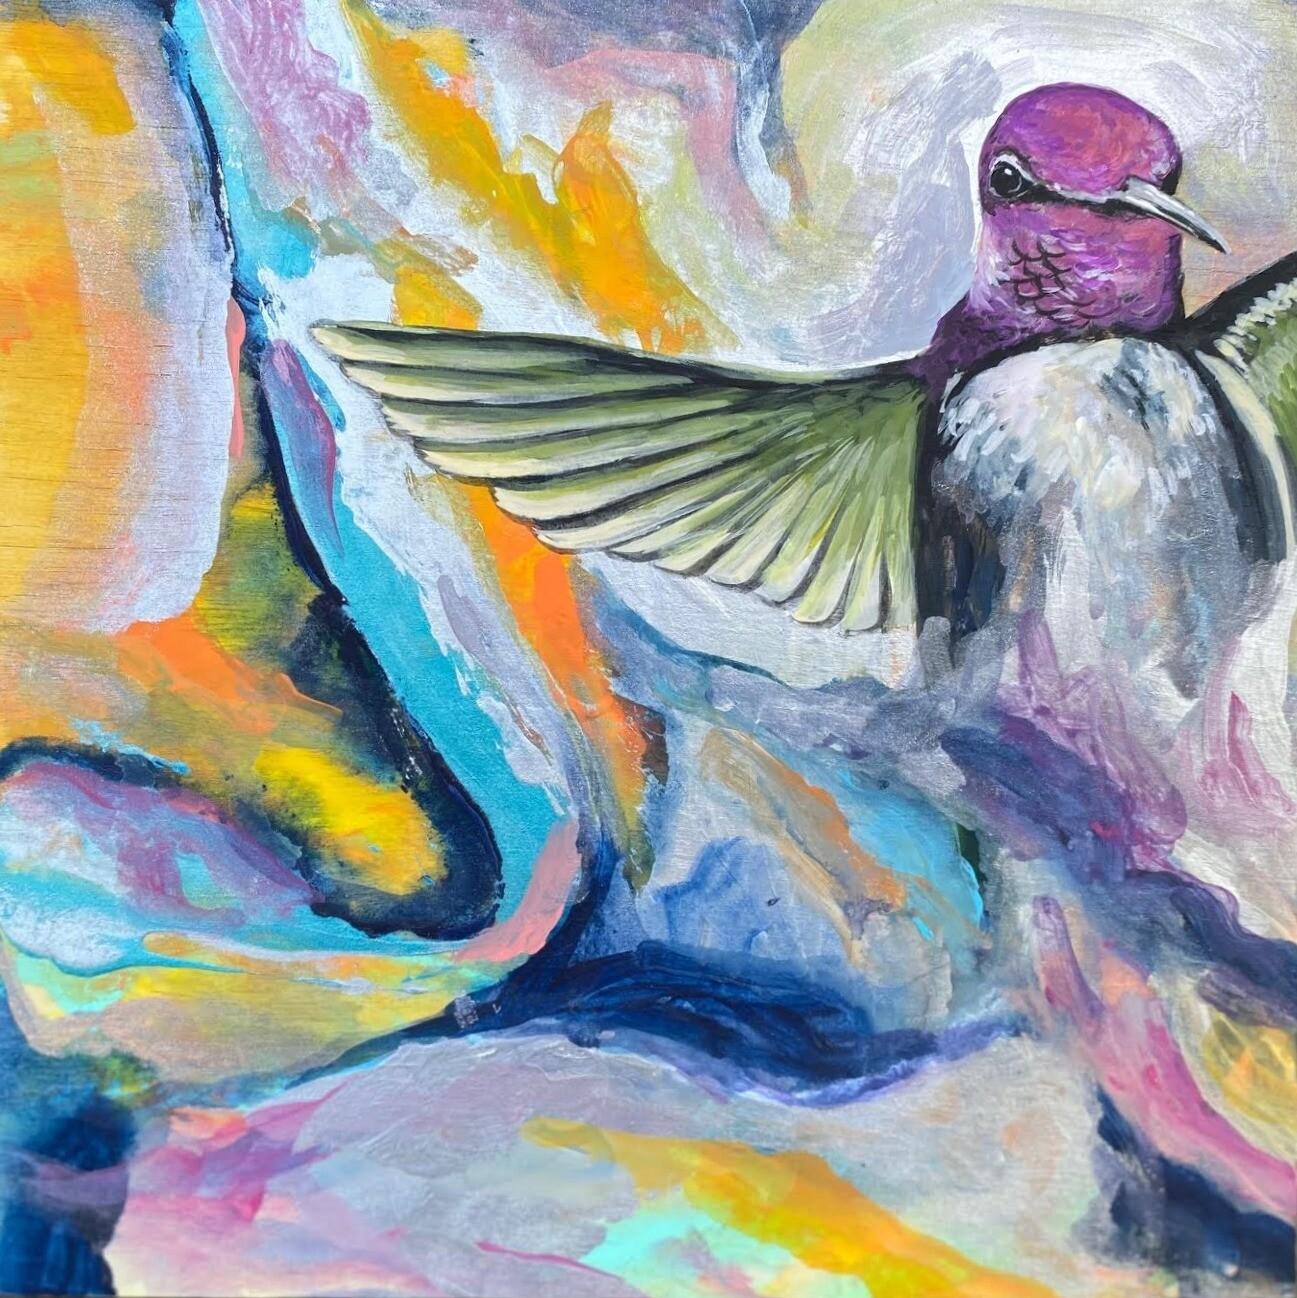 Hummingbird Dream painting on woodboard